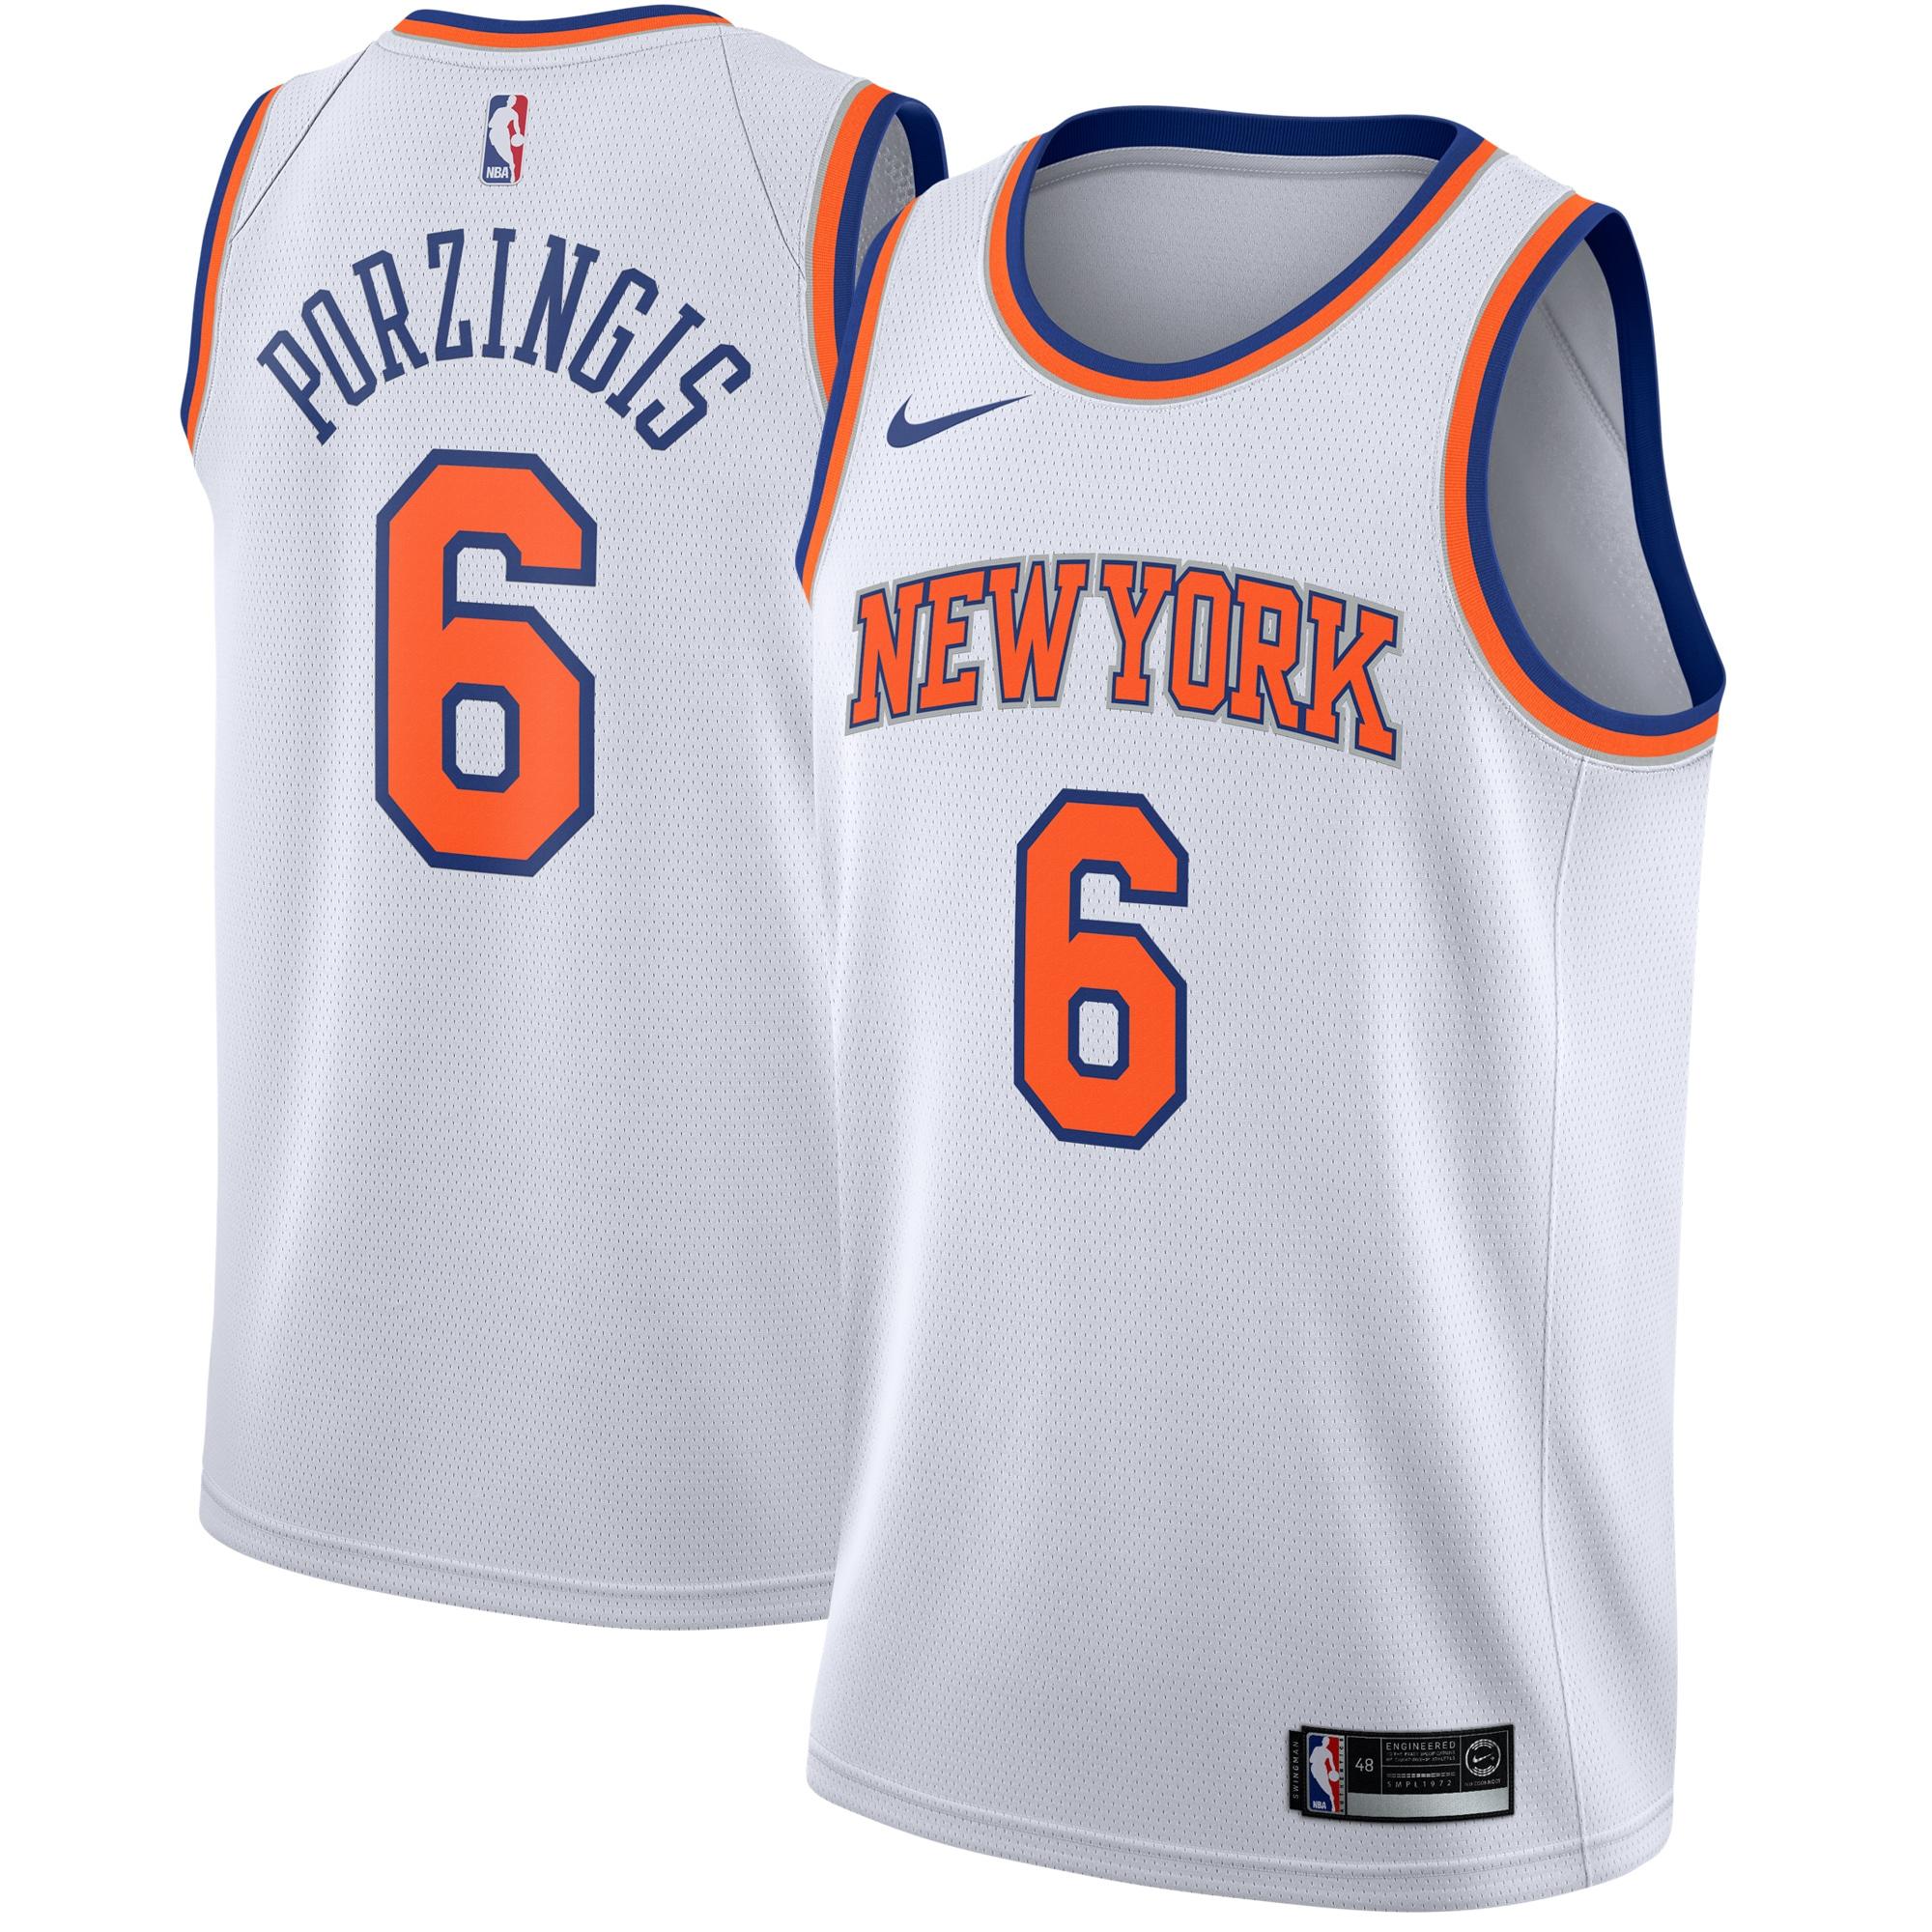 Kristaps Porzingis New York Knicks Nike Swingman Jersey White - Association Edition